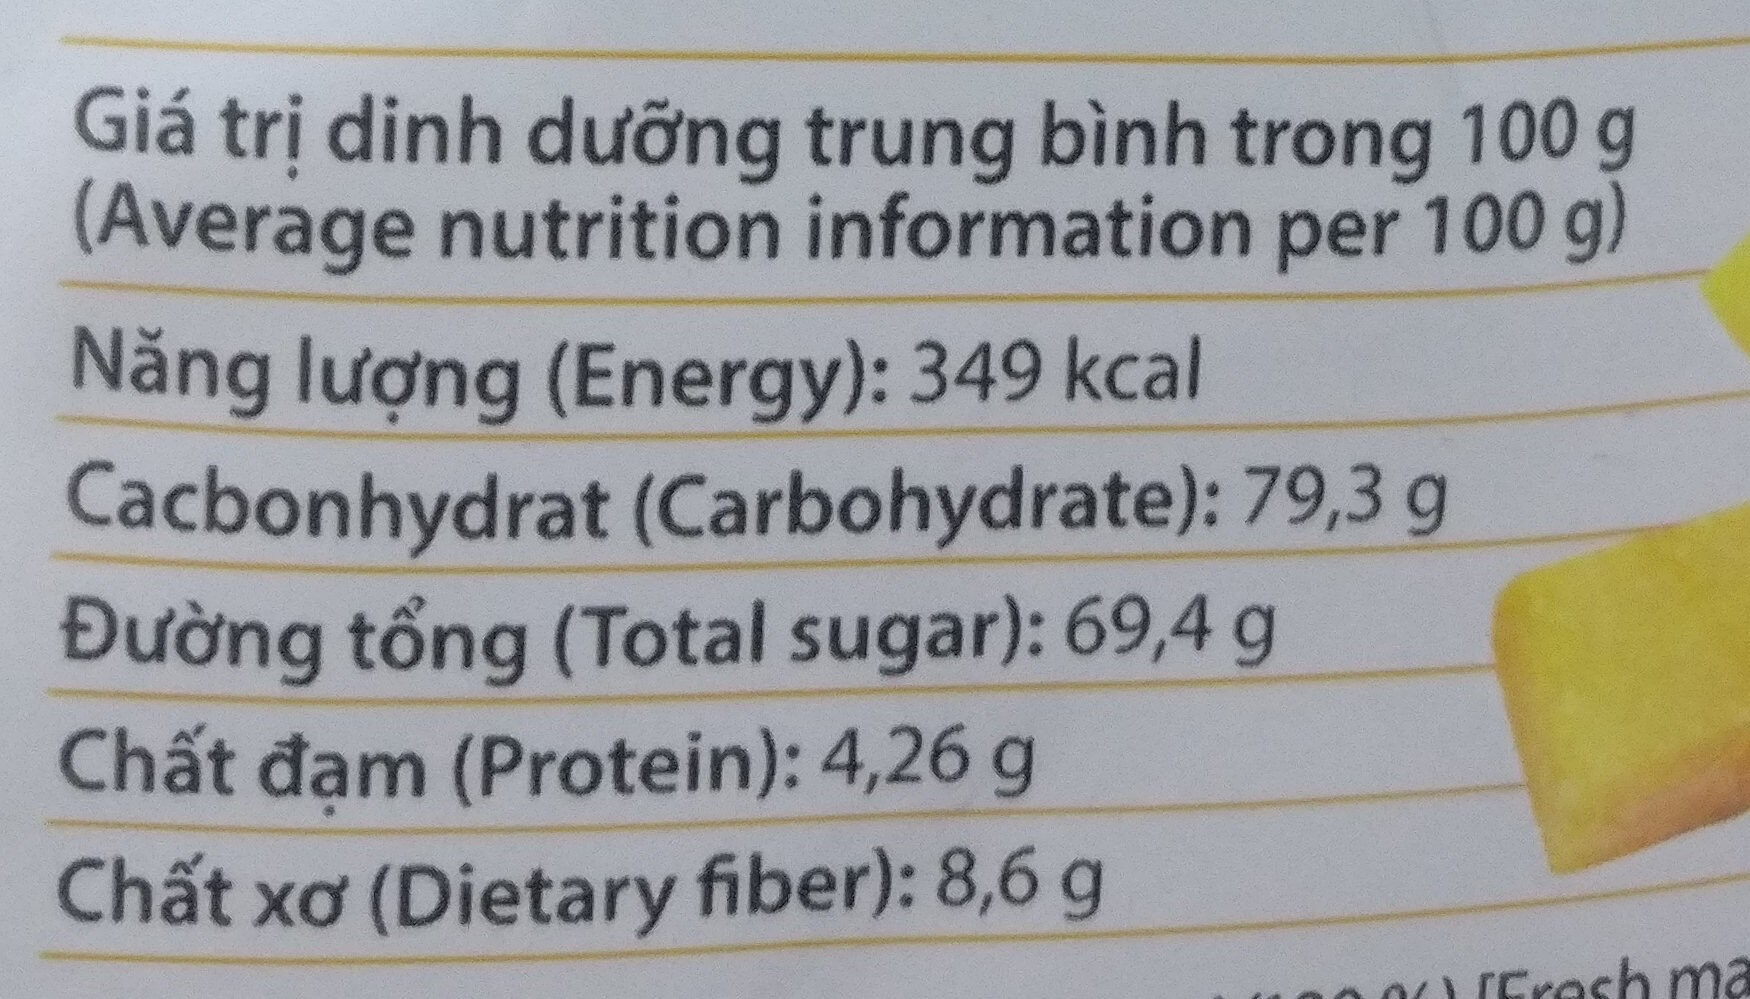 Dried Fresh Mango - Giá trị dinh dưỡng